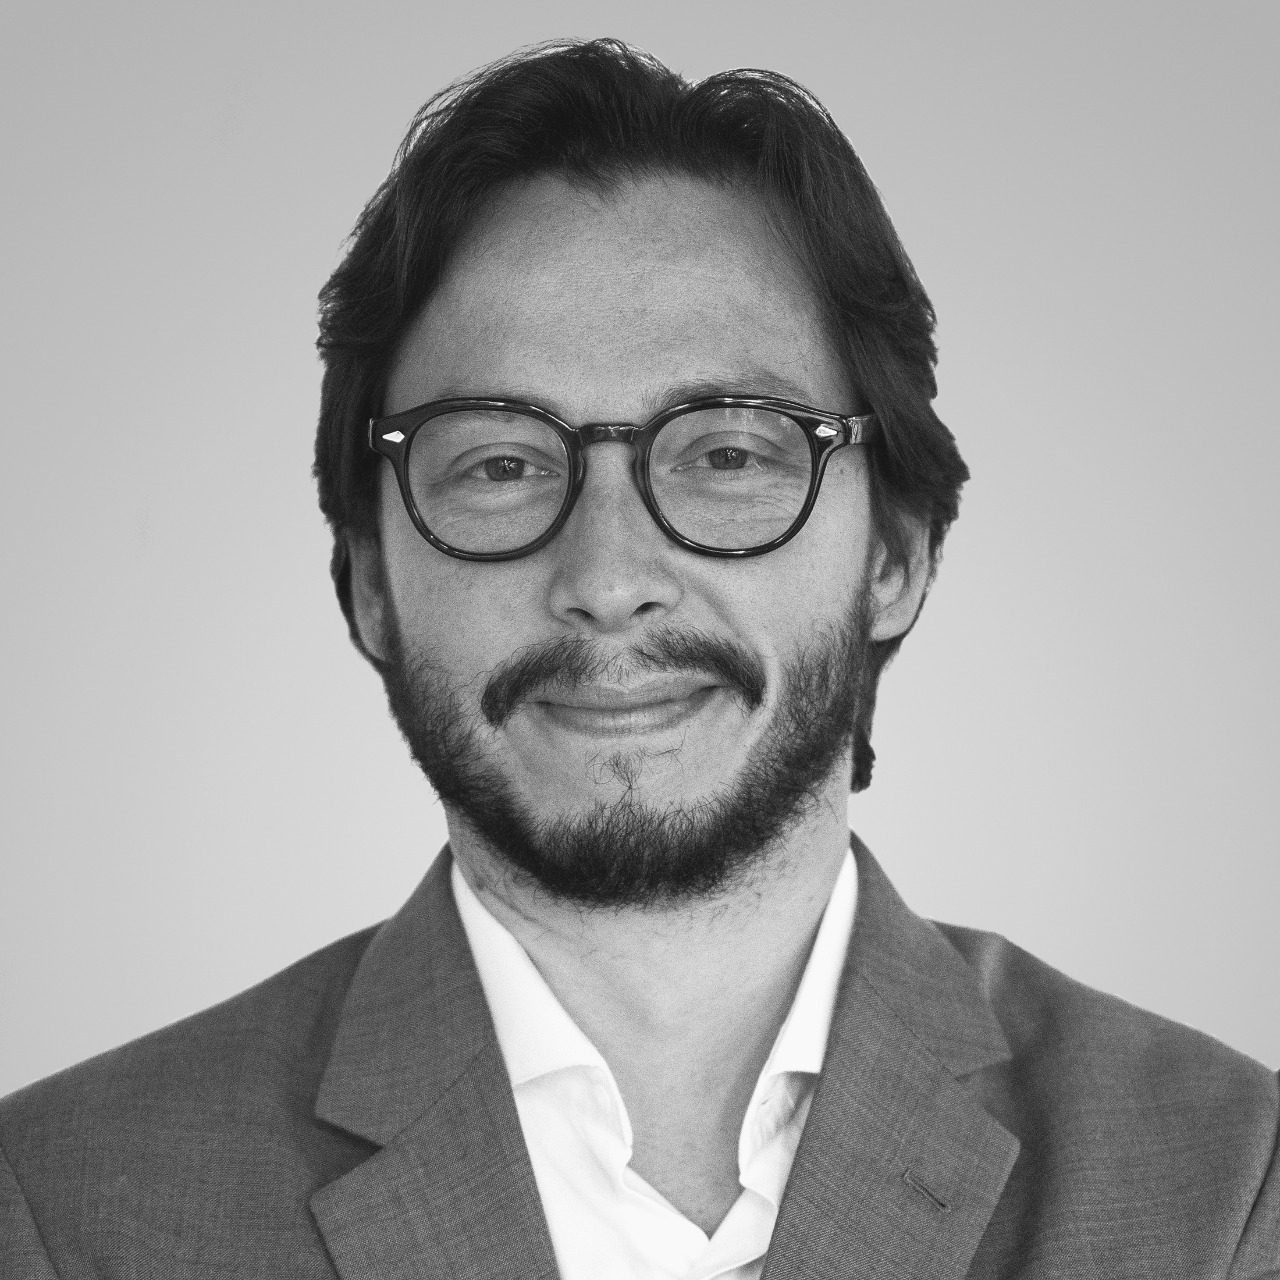 Stefano Sergole